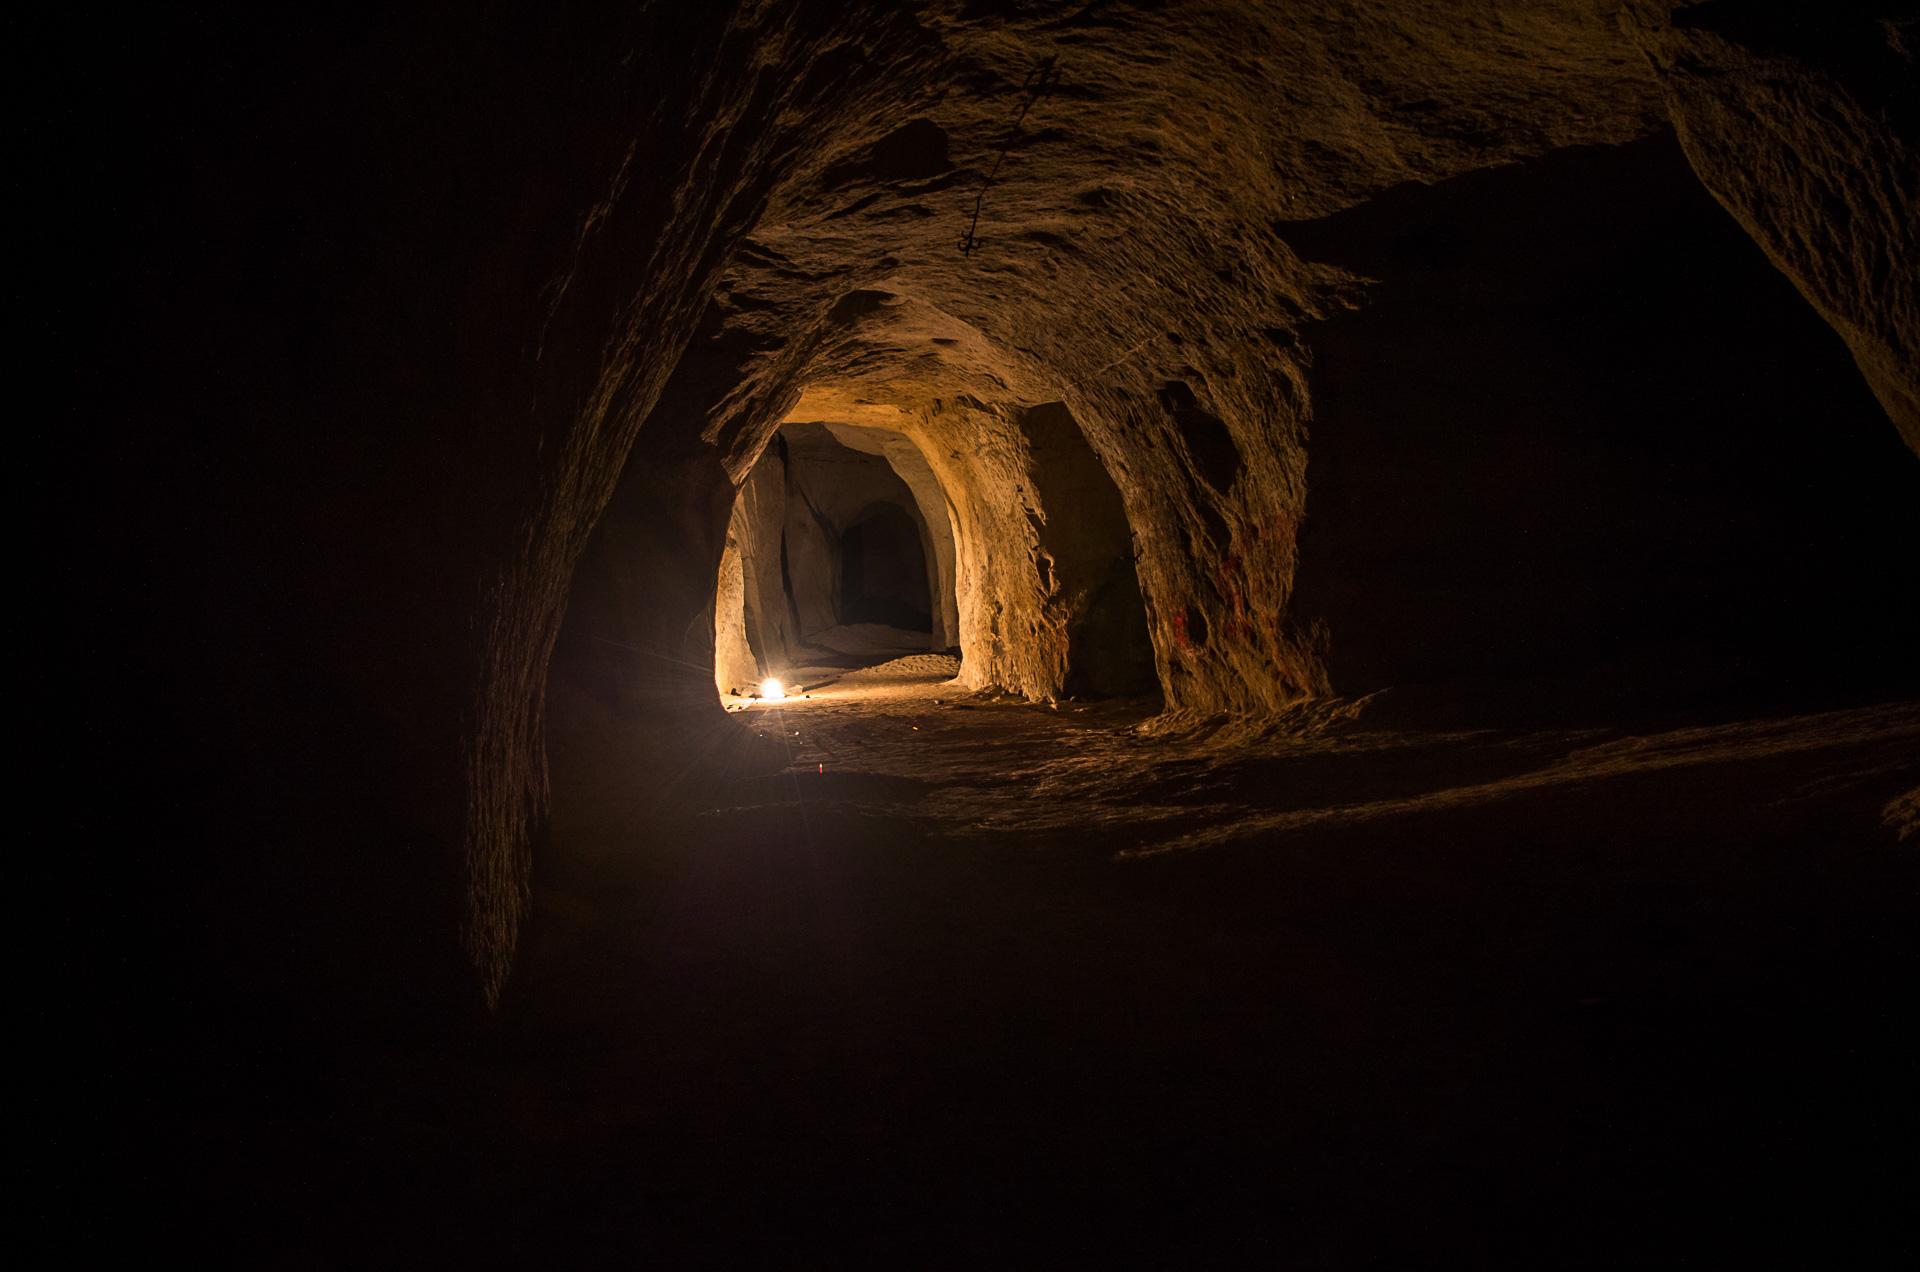 Verlassene Orte – tief drinnen im Berg in tiefdunkler Totenstille – Narwal